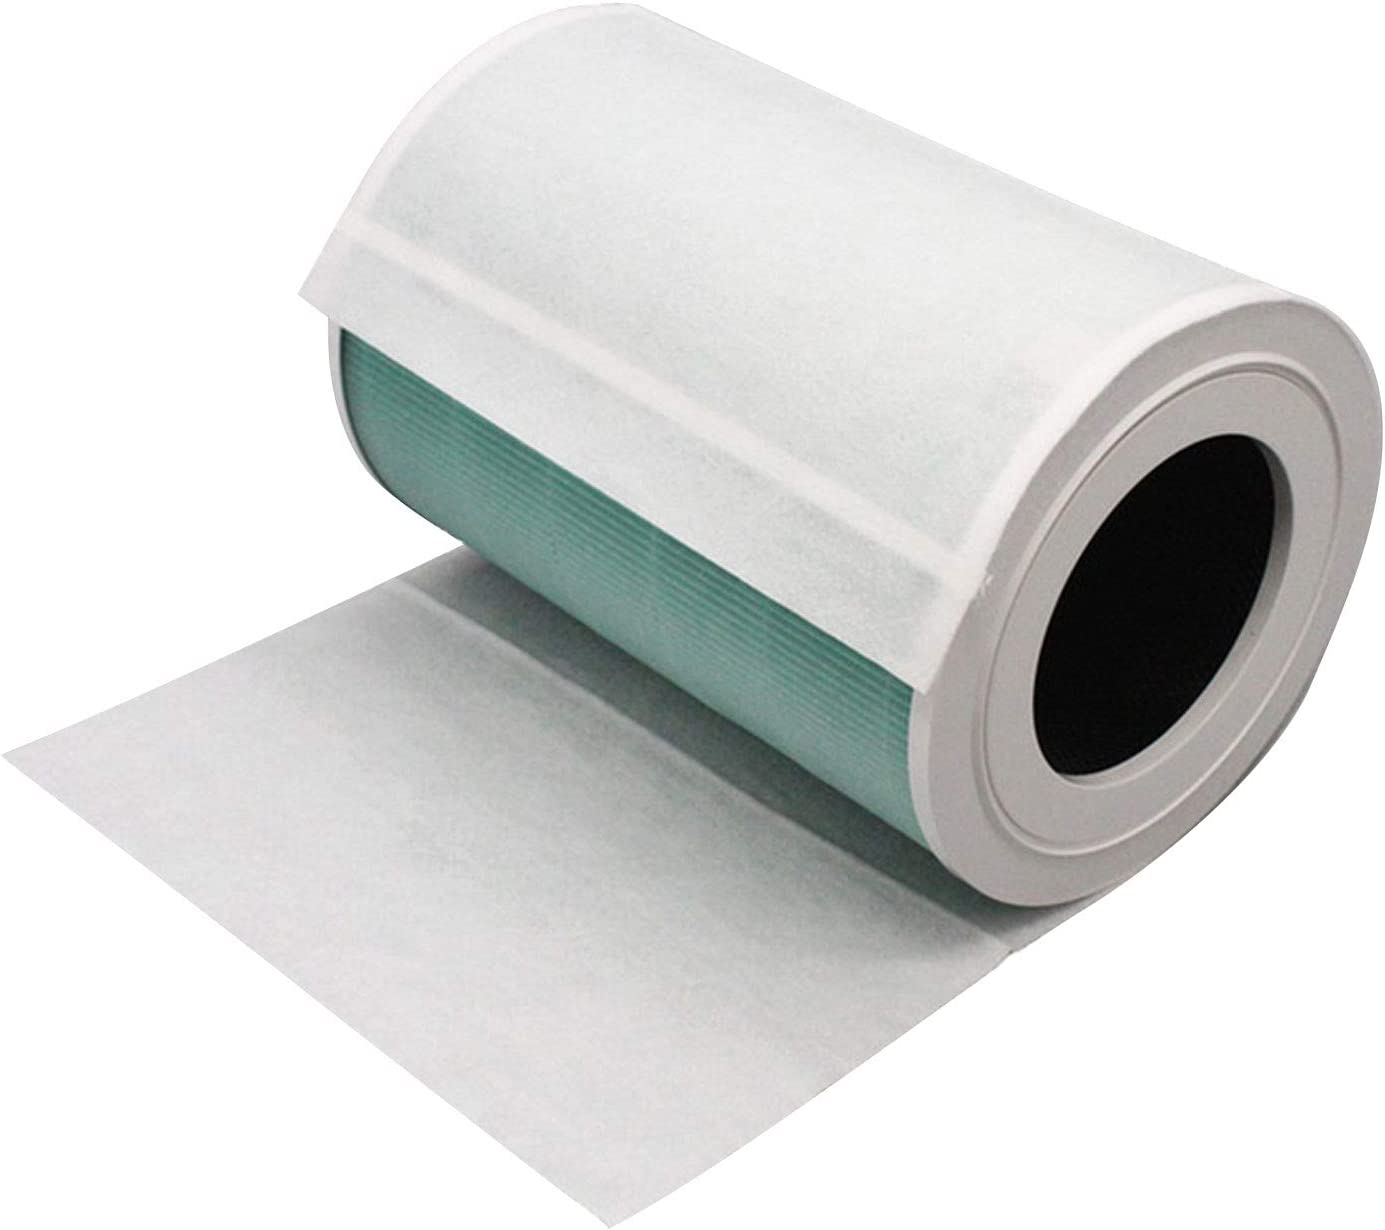 HIKSHAPER Electrostatic Filter Cotton 10 Sheet 28 x 12 Electrostatic Filter Cotton HEPA Filtering Net Compatible with Philips Xiaomi Mi Air Purifier